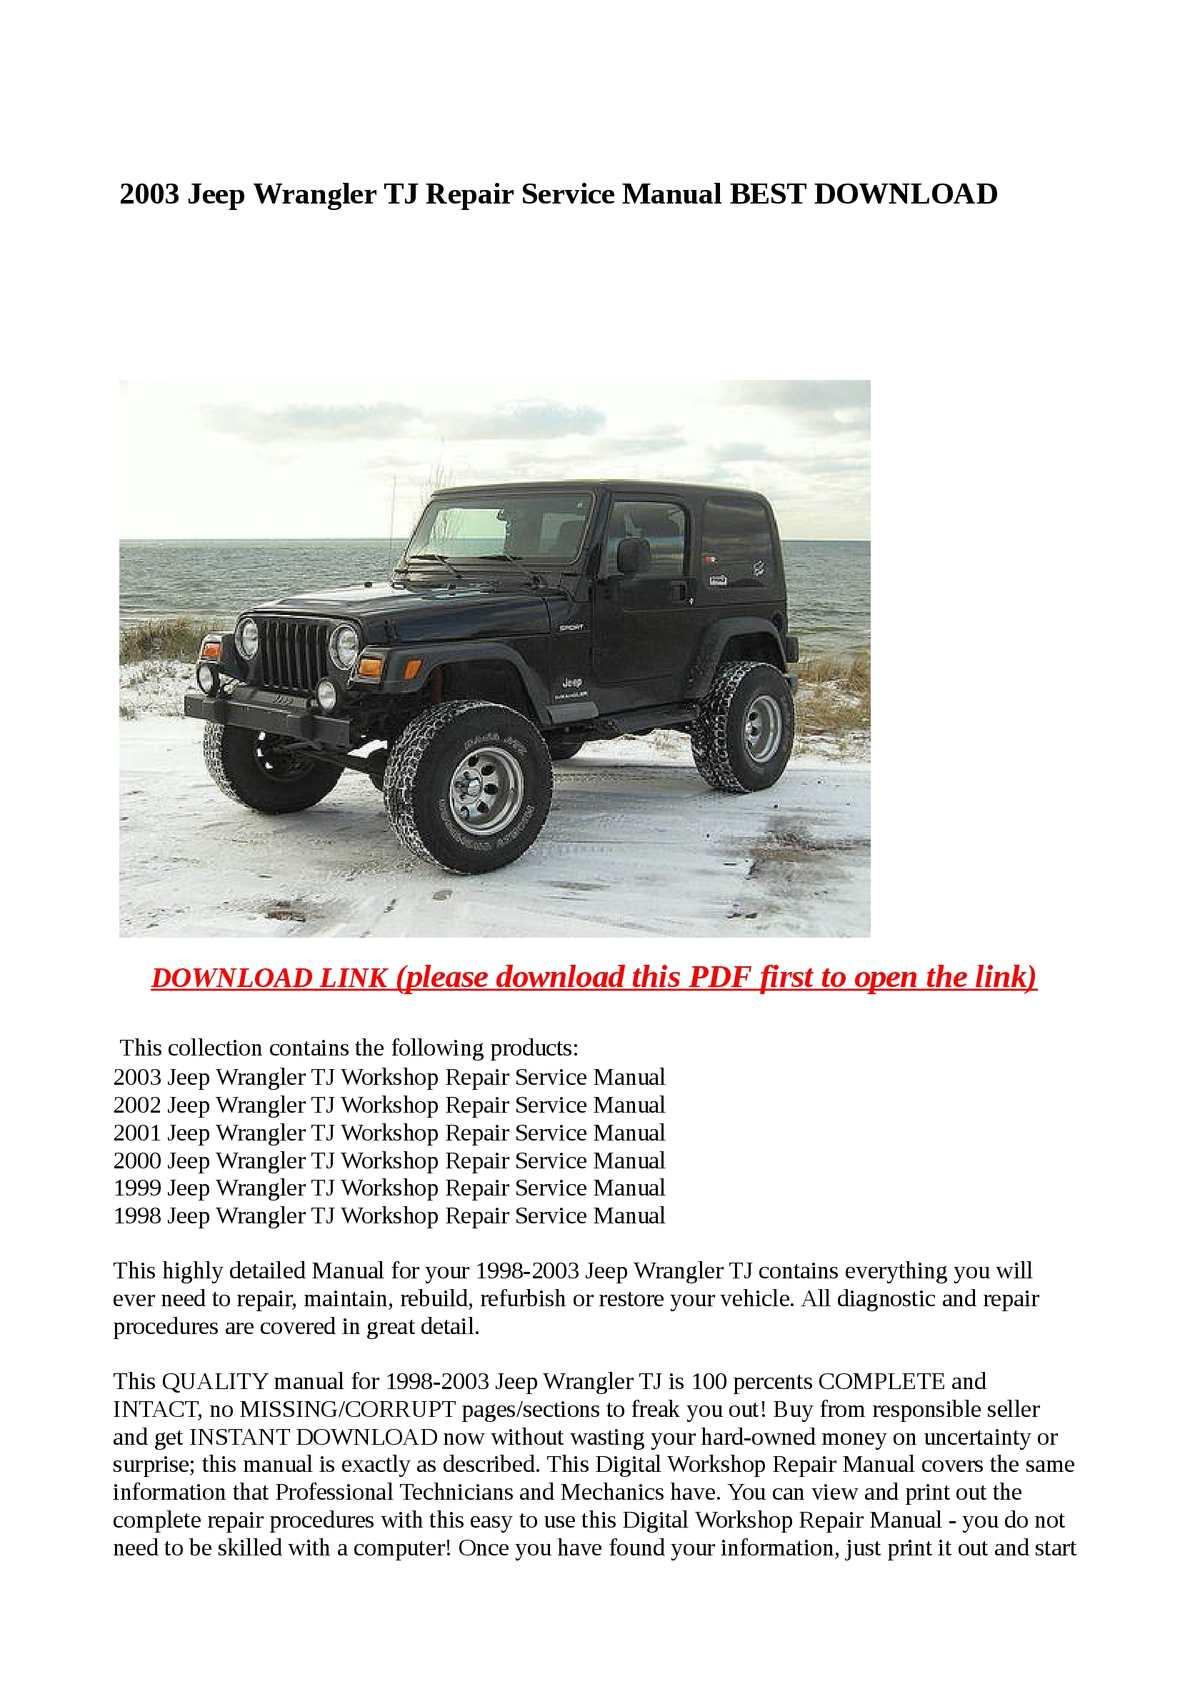 Calaméo - 2003 Jeep Wrangler TJ Repair Service Manual BEST